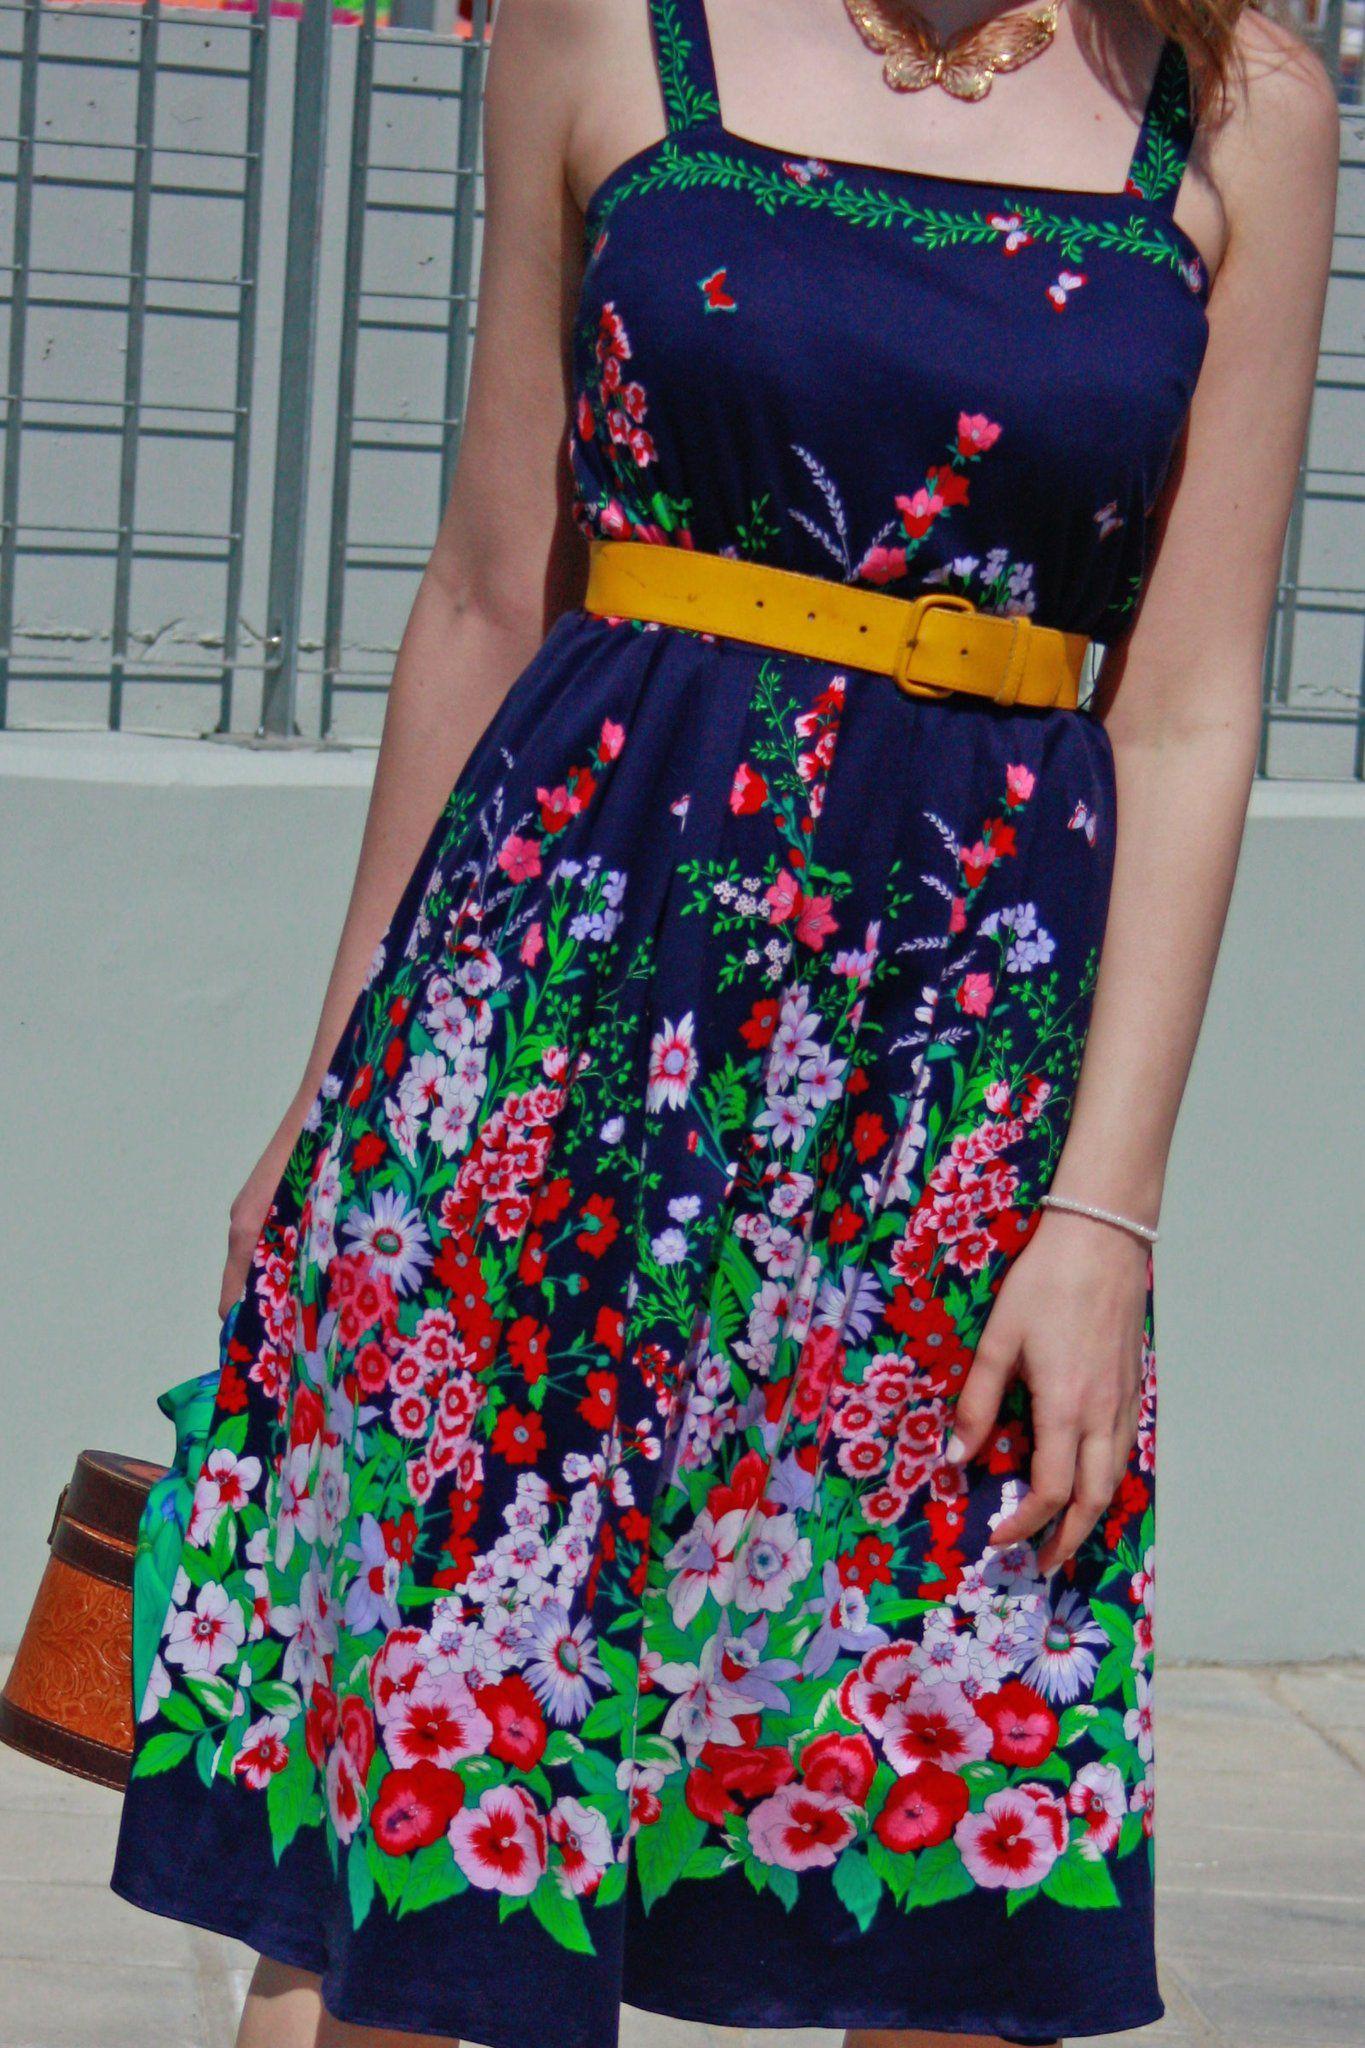 Vintage Summer 60 S Dress Solovesvintage 60s 60sfashion 60sfloral Floraldress Vintage60s Summerdress Vint Summer Dresses Dresses Vintage Style Dresses [ 2048 x 1365 Pixel ]